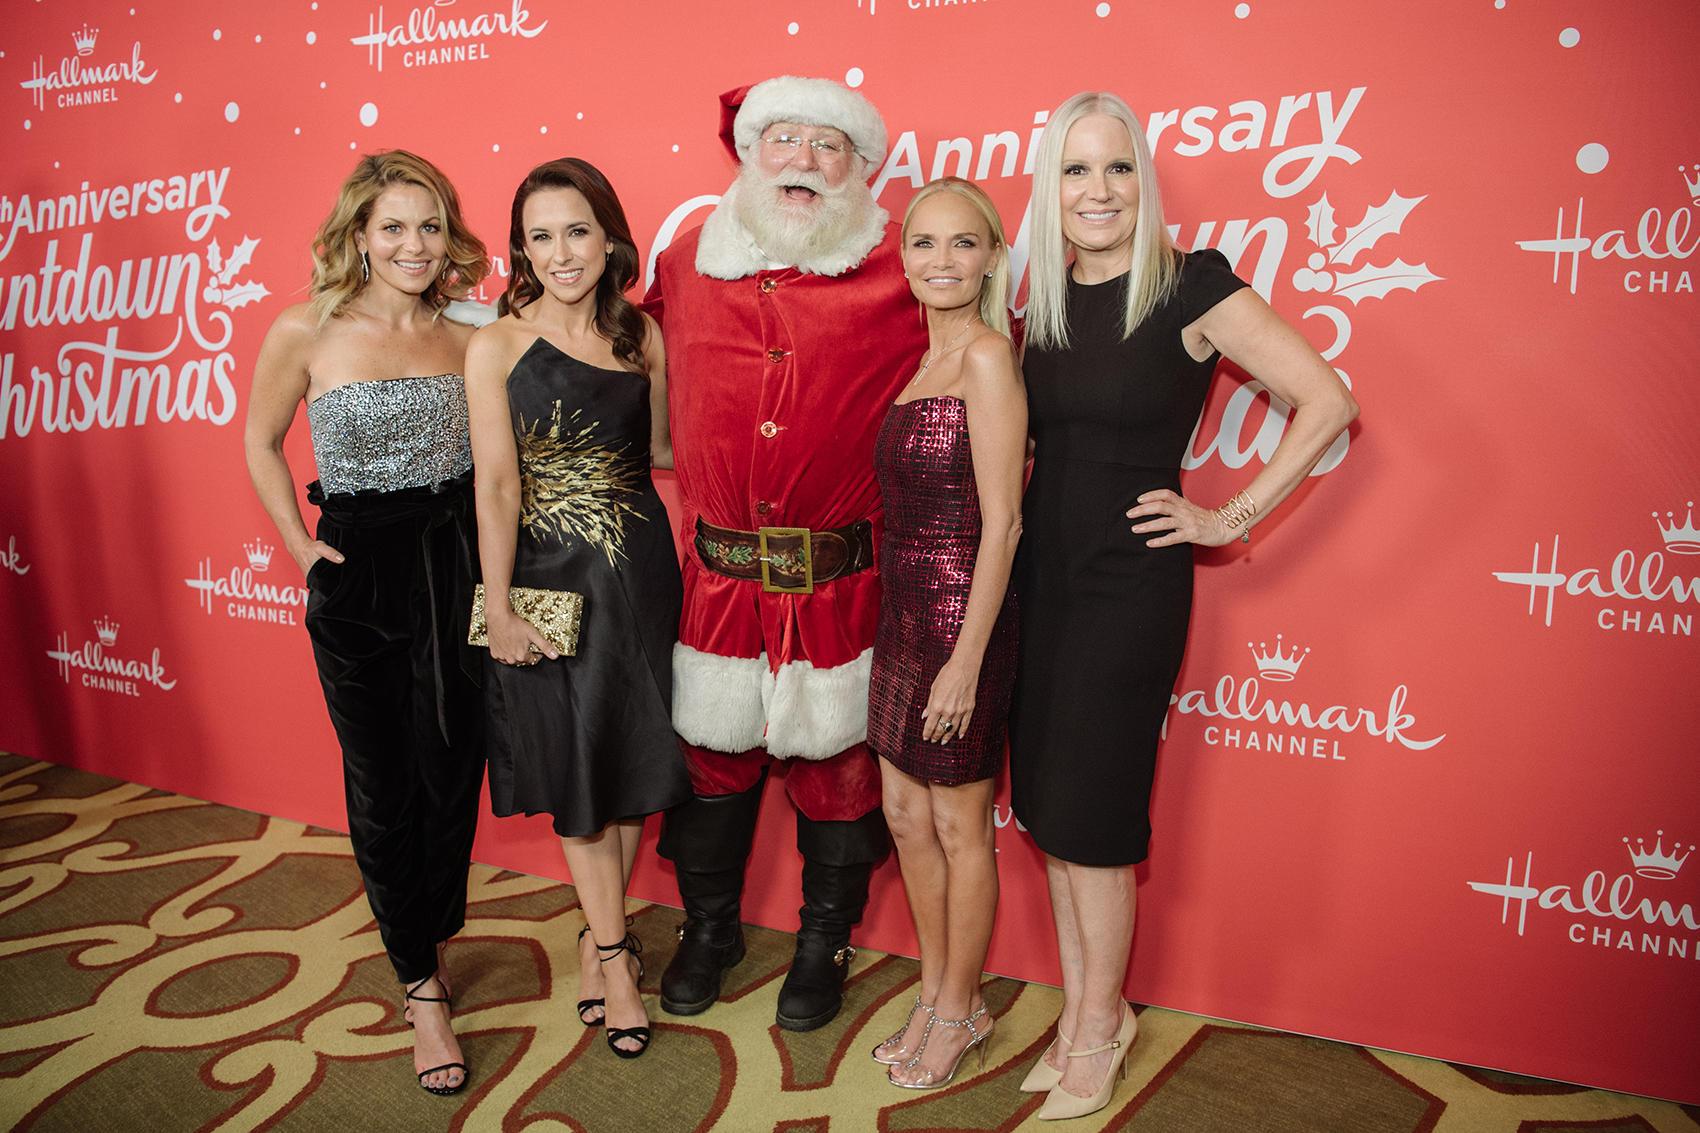 Hallmark Christmas Movies Are Comin' To Town — Already